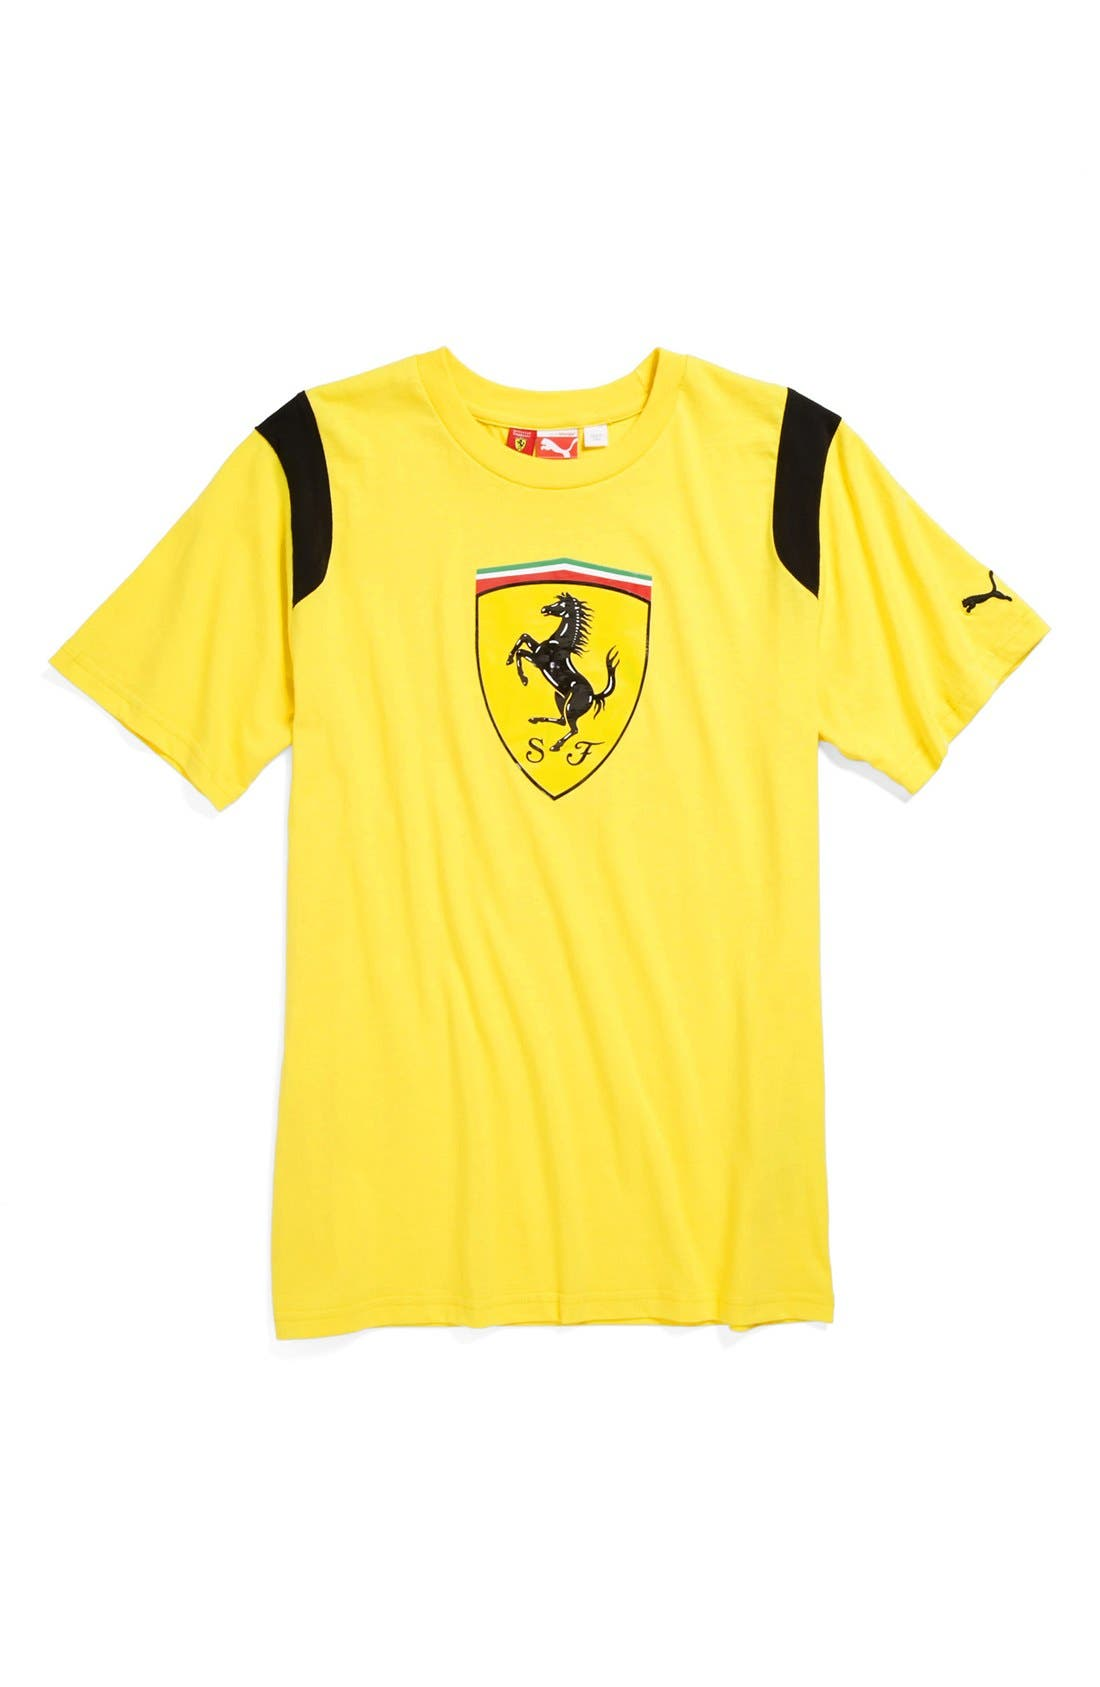 Alternate Image 1 Selected - PUMA 'Ferrari' Graphic T-Shirt (Big Boys)